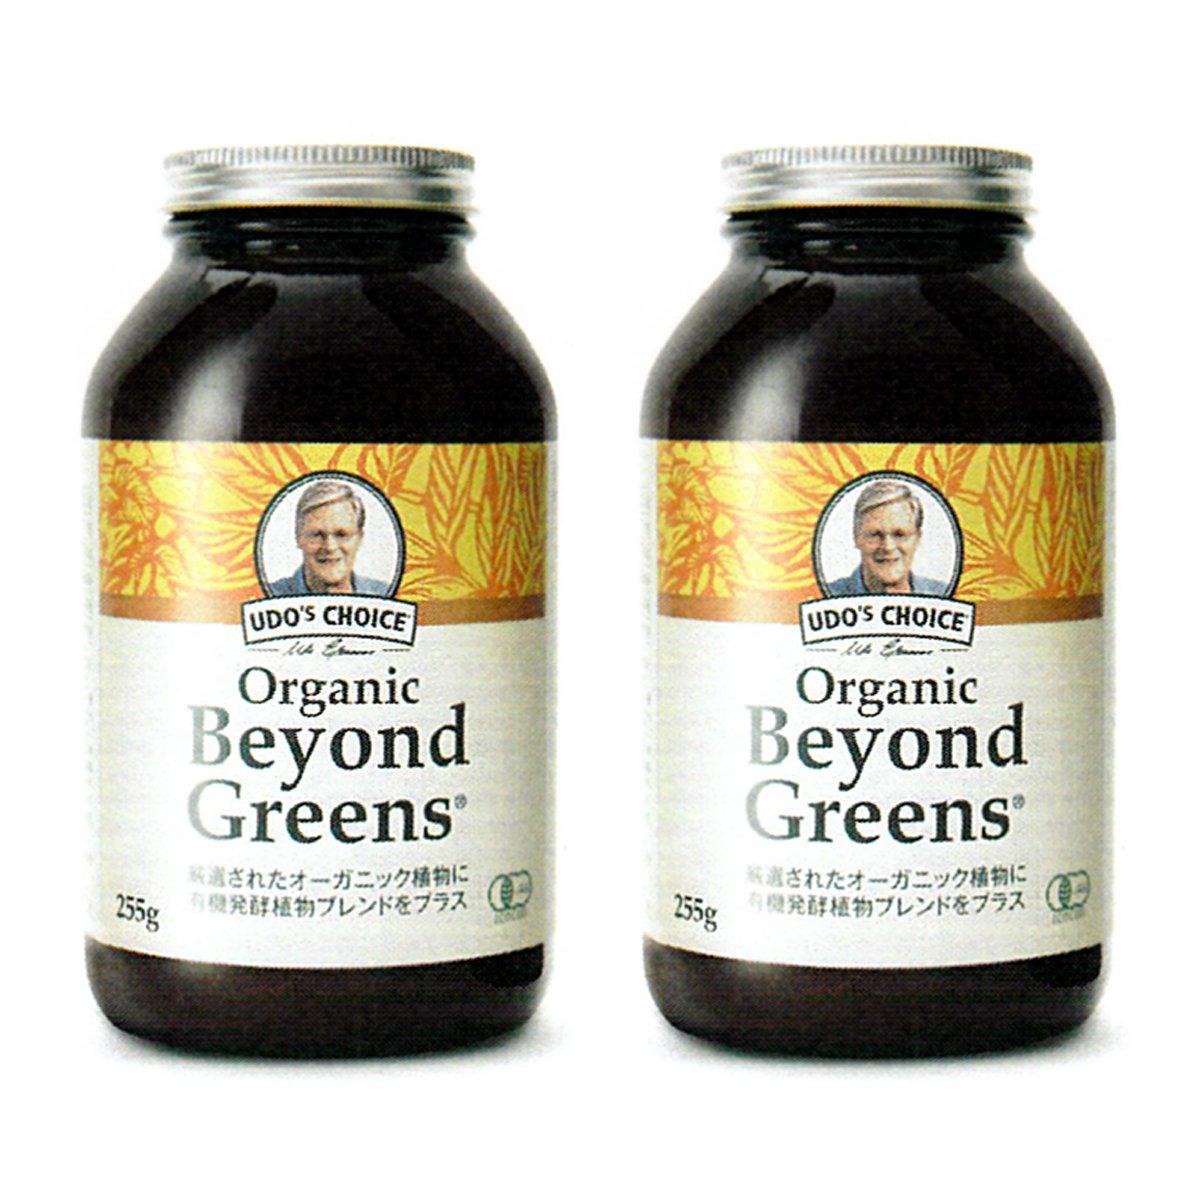 FLORA フローラ 健康補助食品 有機発酵植物乳酸菌配合 オーガニック ビヨンドグリーンズ 255g 2個セット   B079Q4VBTF